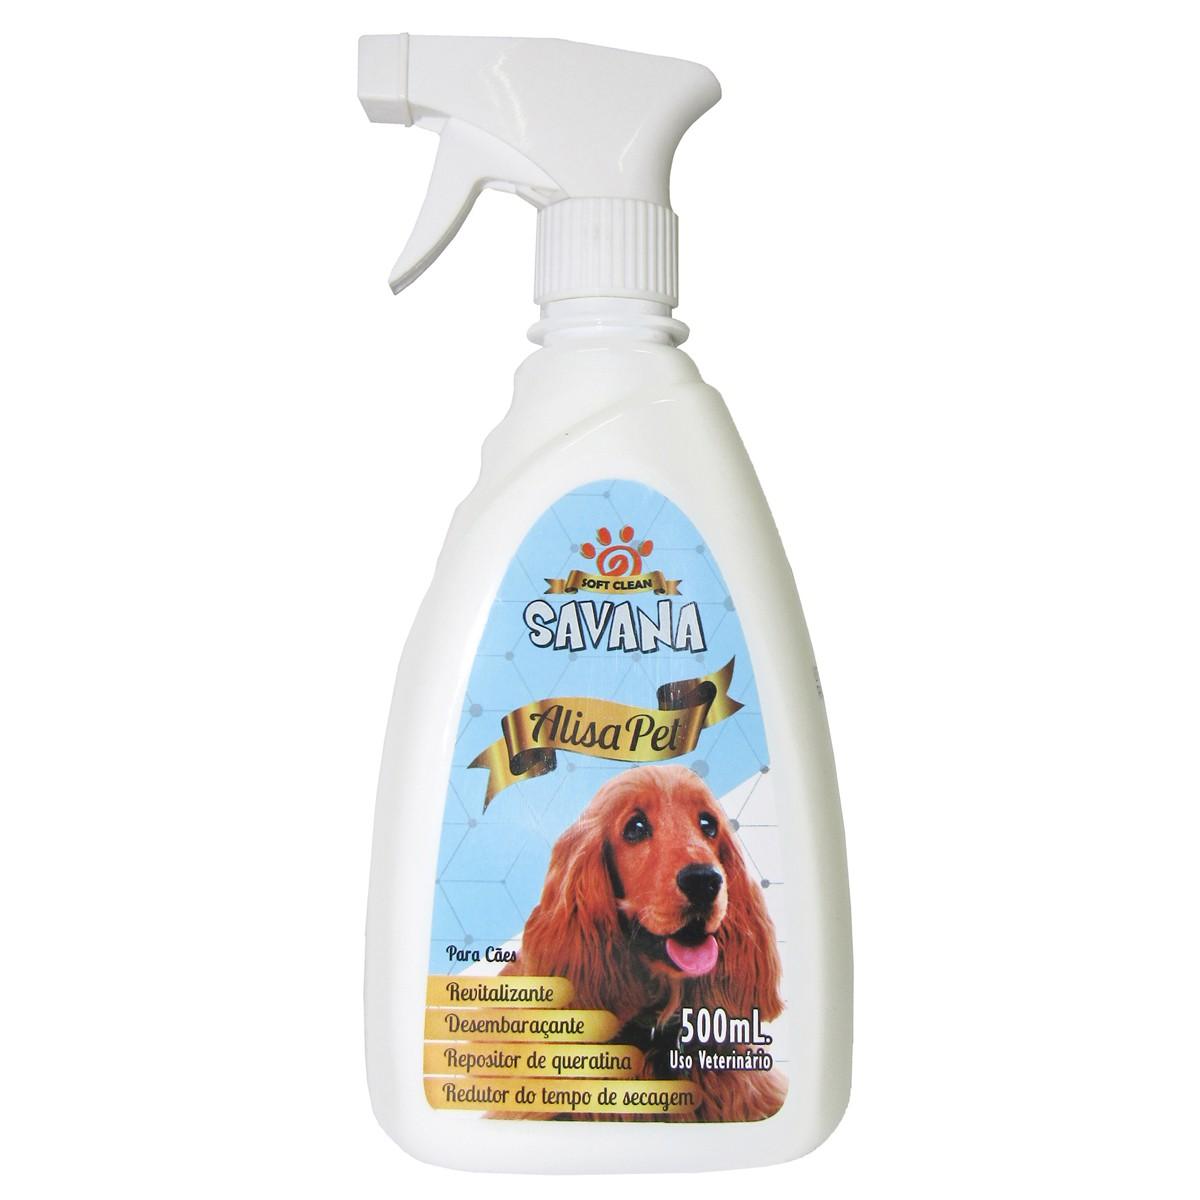 Alisapet Spray 500ml Savana Pet